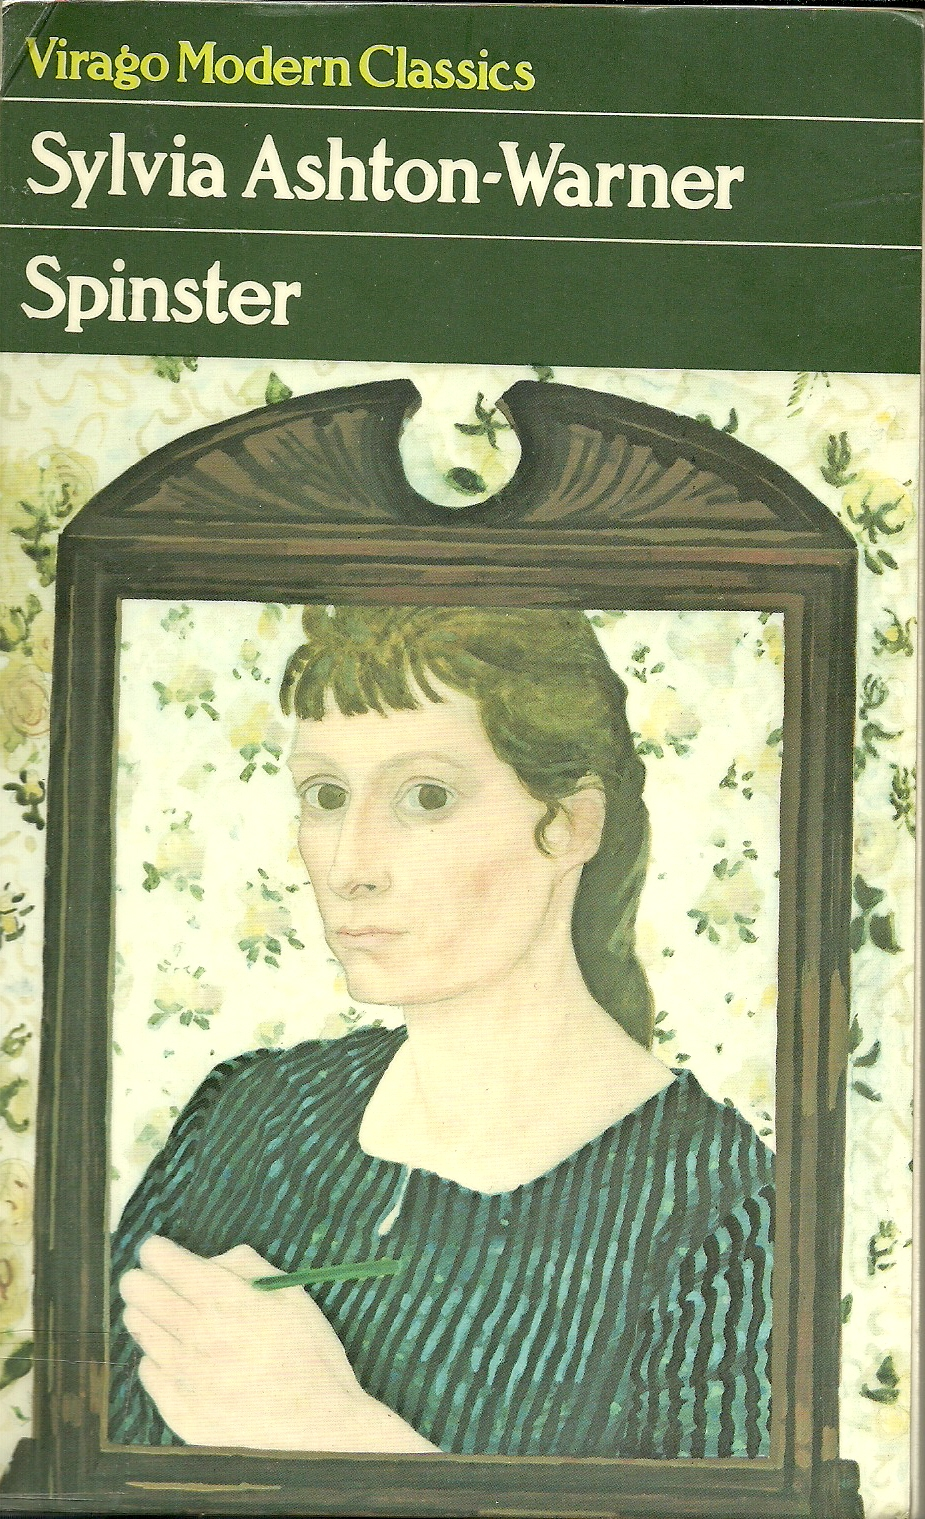 Spinister